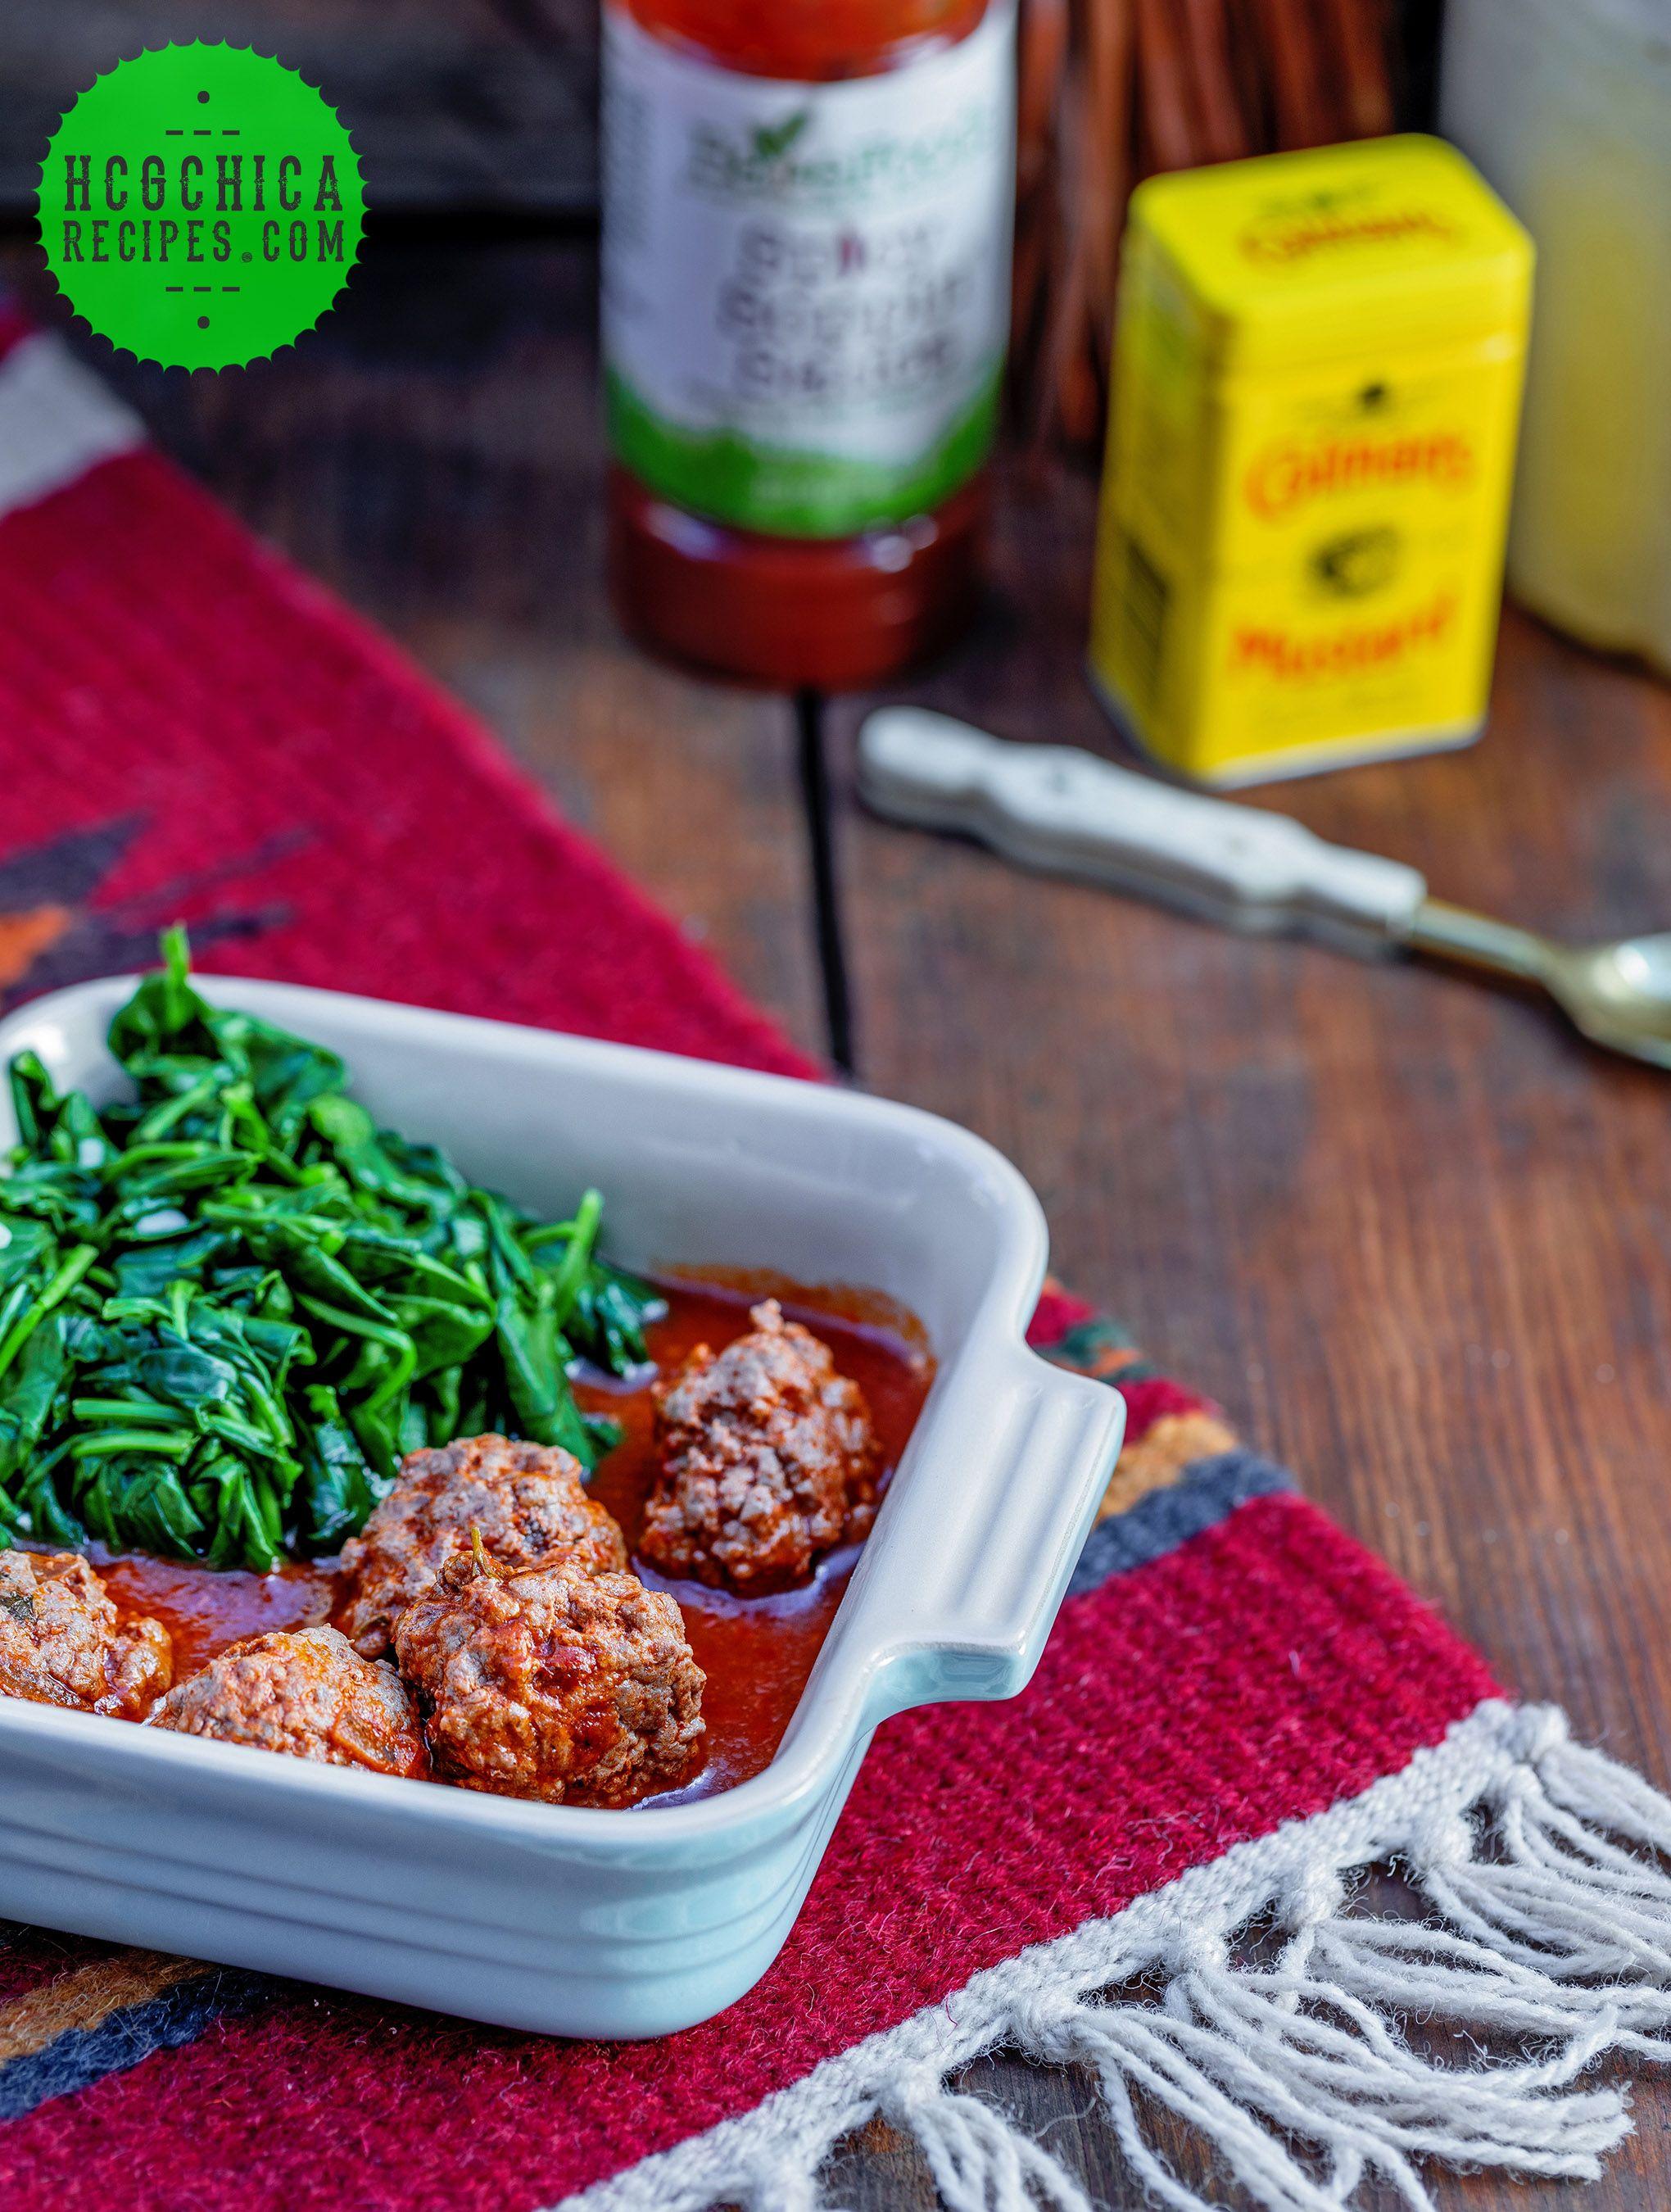 P2 Hcg Recipe Bbq Meatballs Garlic Spinach Sp Recipe Hcg